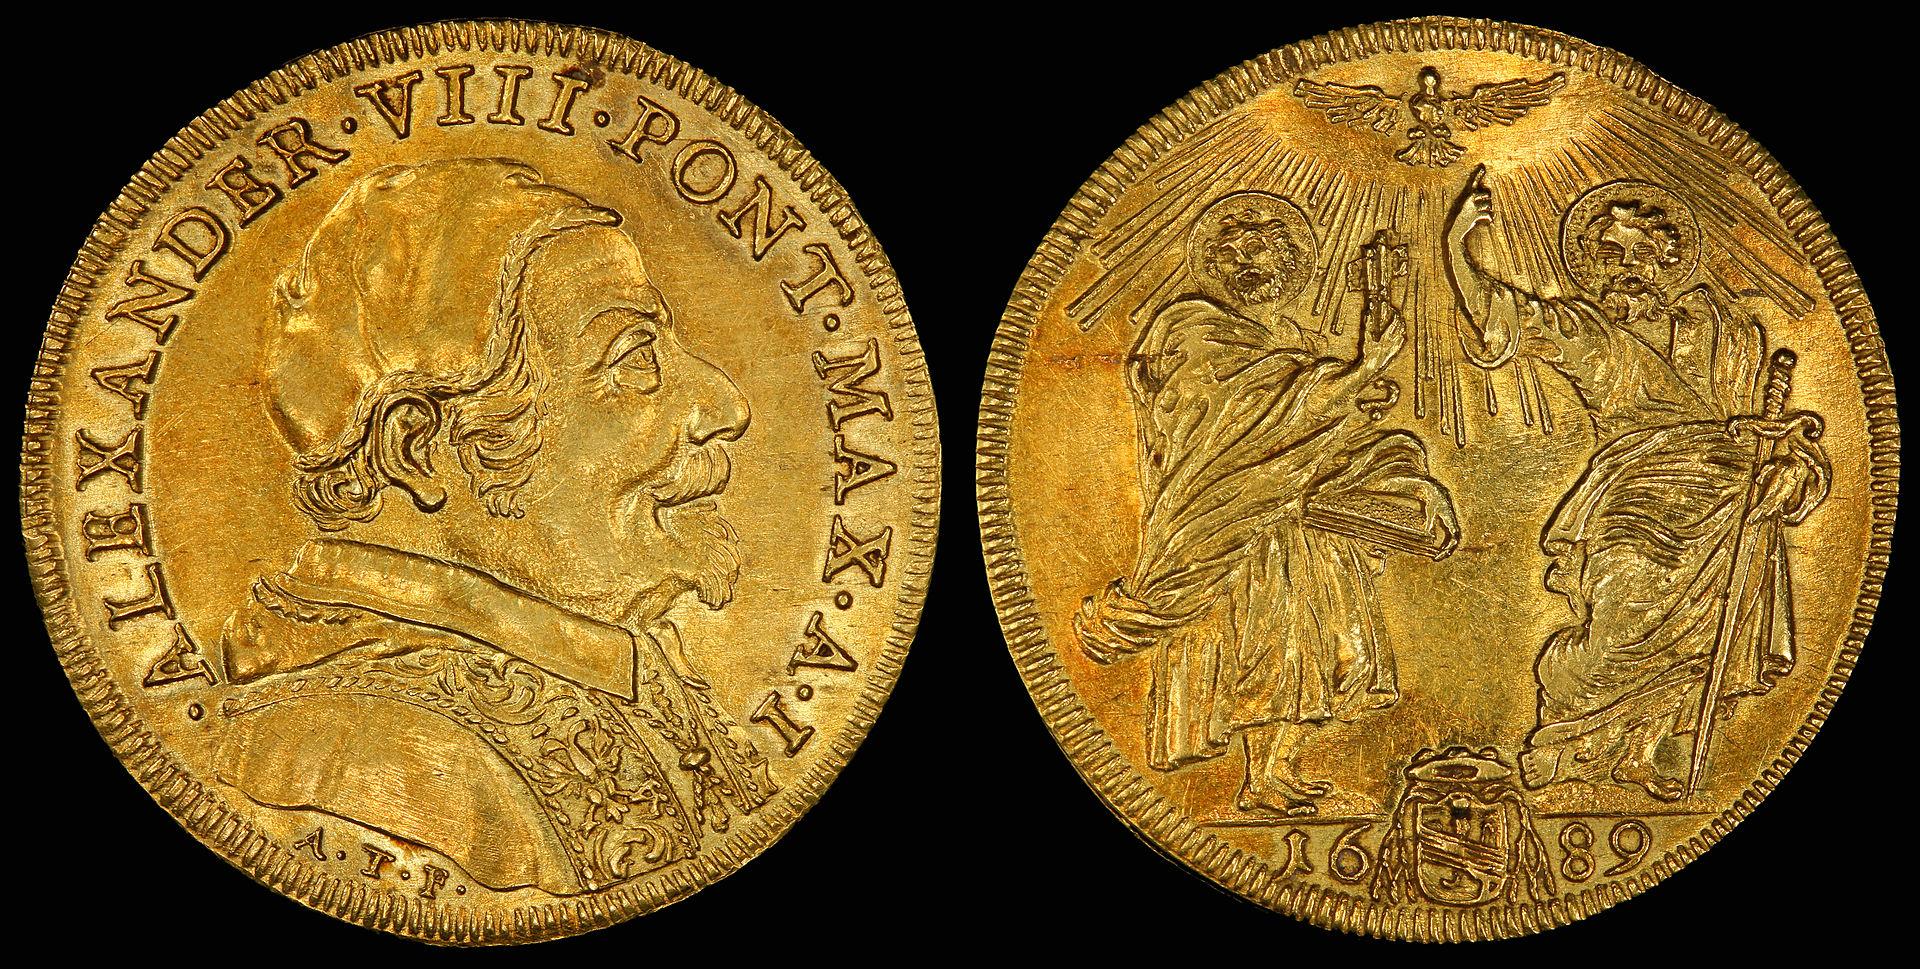 1920px-Italy_Papal_States_1689-I_Quadrupla_Scudo_d'Oro.jpg